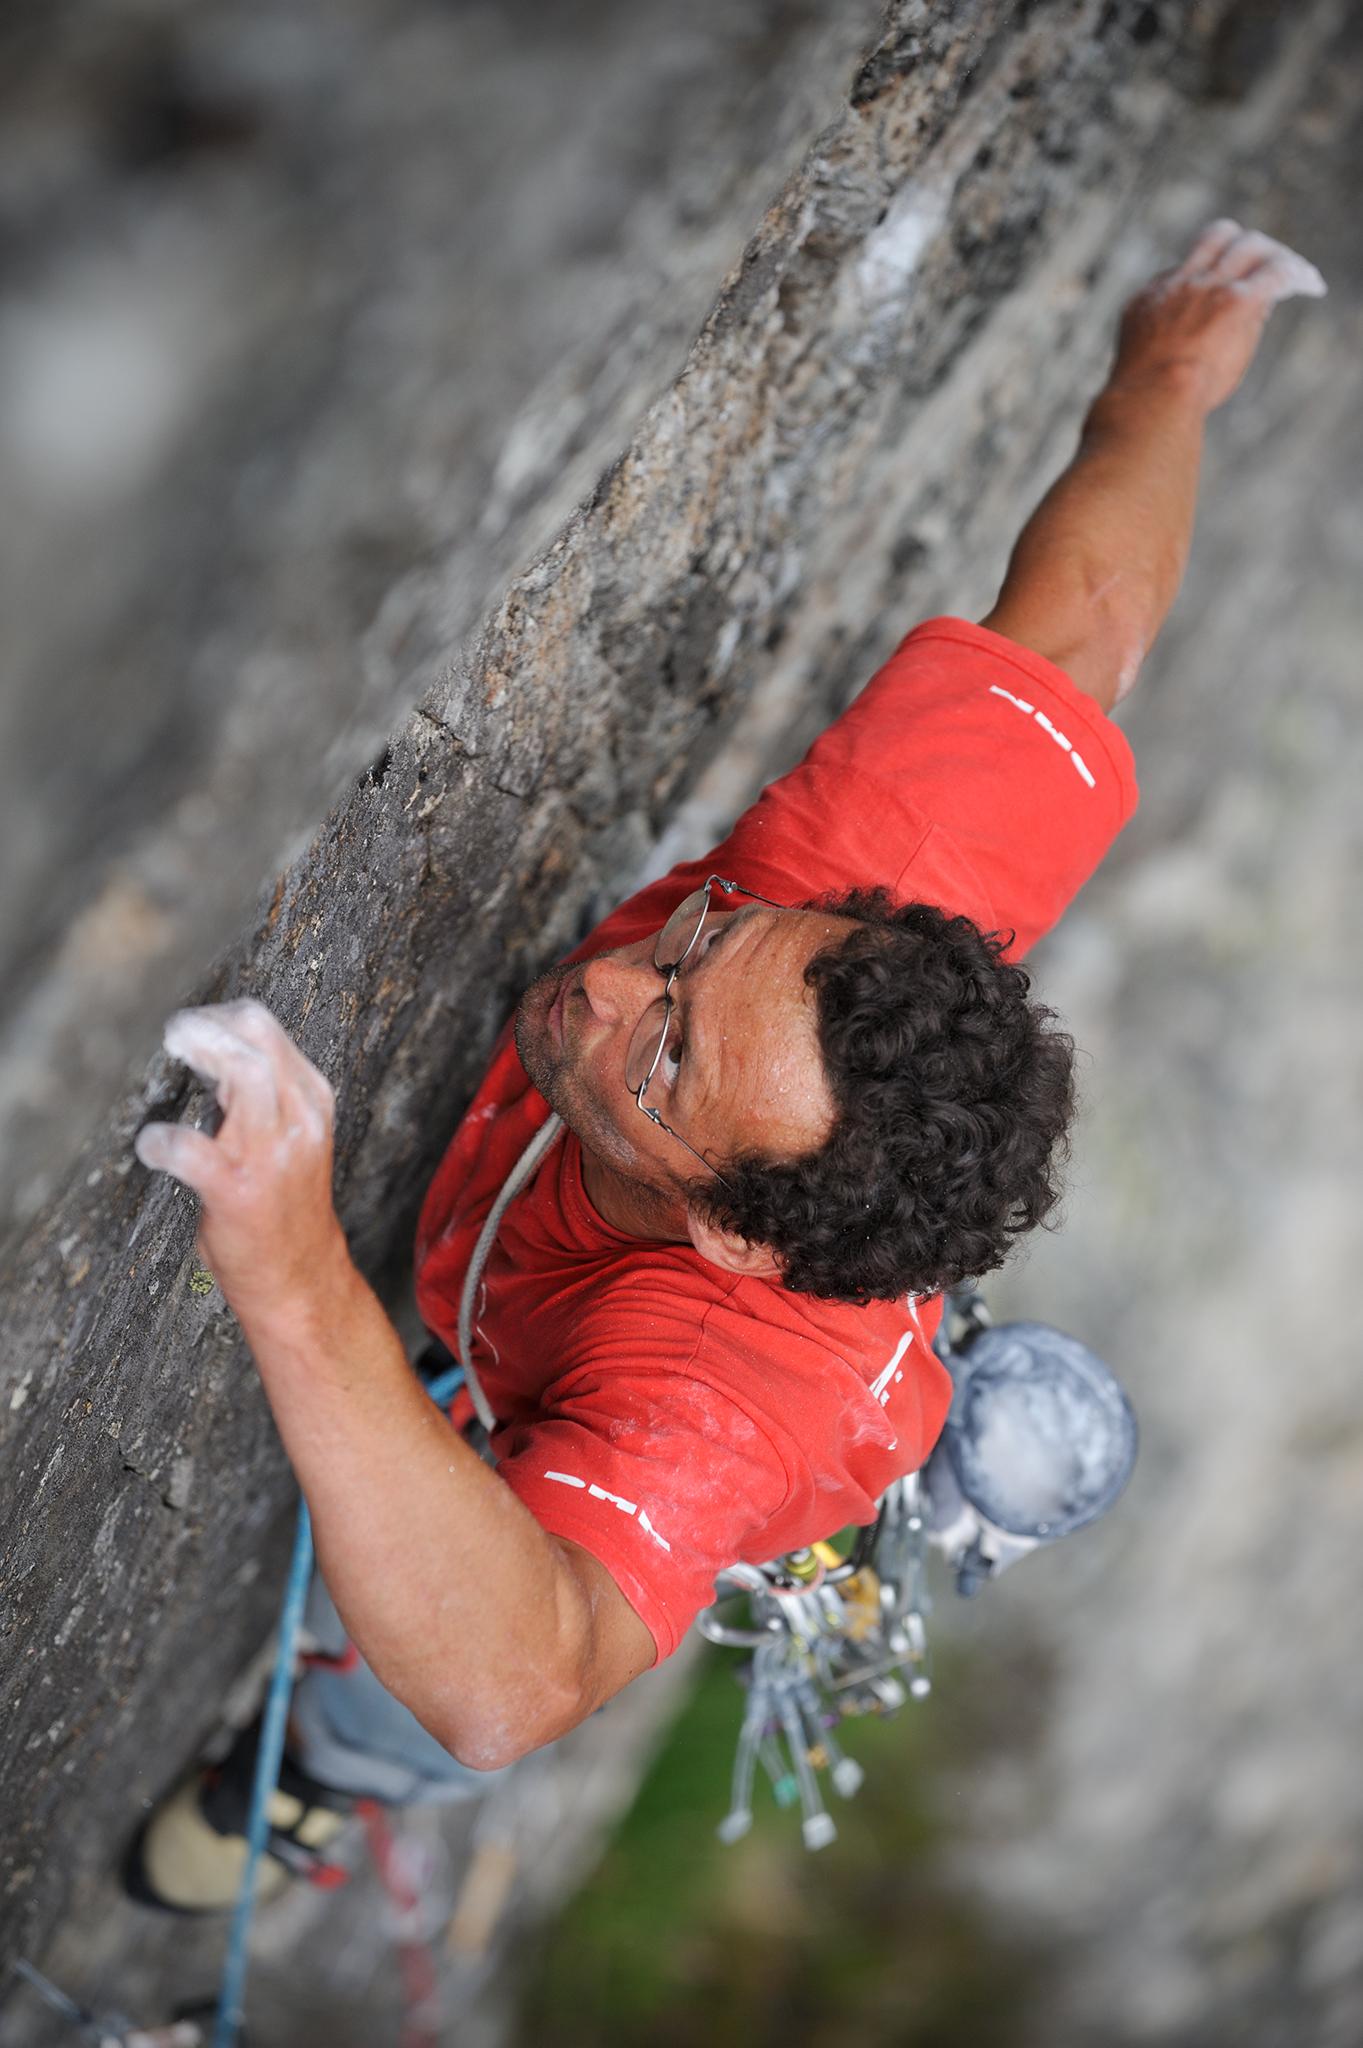 Nick Bullock on first ascent of Shockwave E6 6a, Gallt yr Ogof, Ogwen